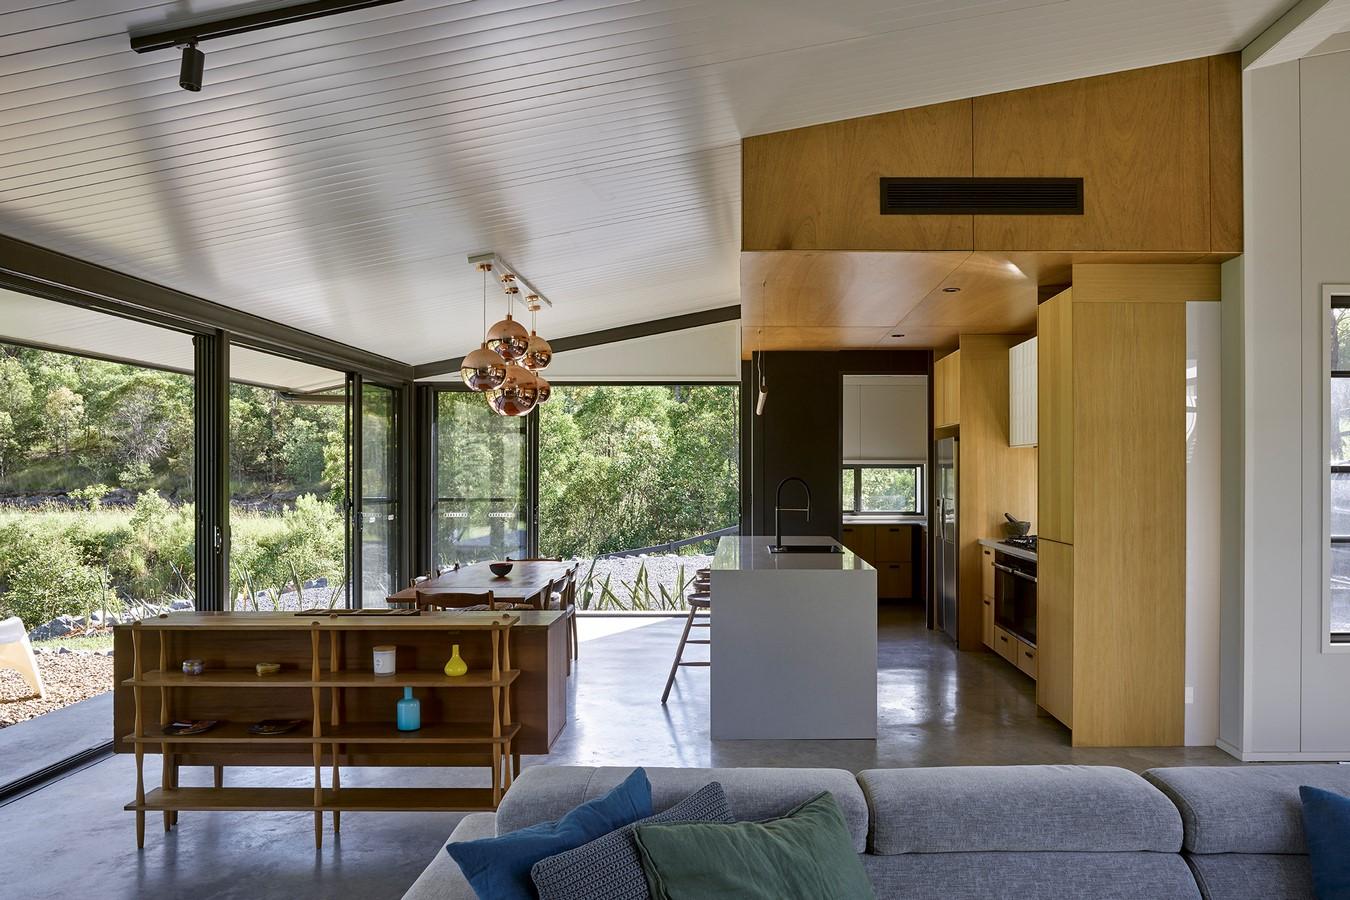 C Residence by Tonic Design - Sheet2